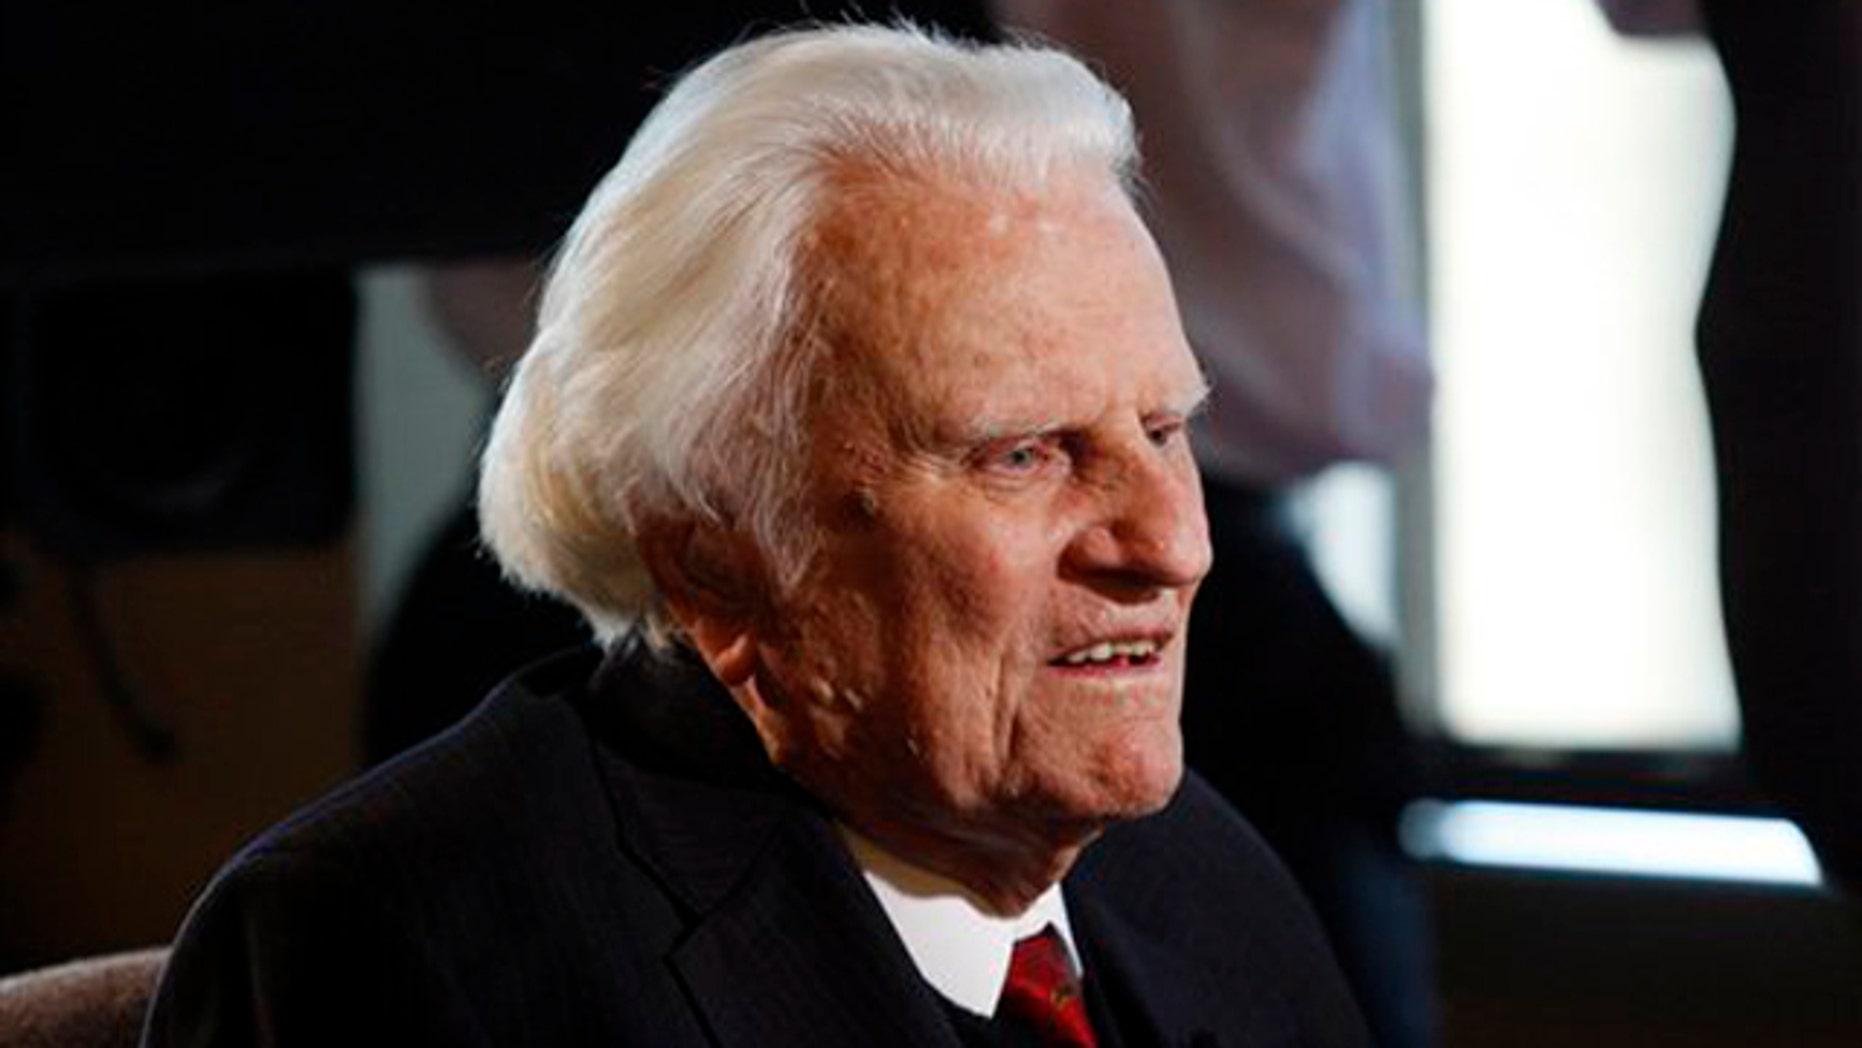 In this Dec. 20, 2010 file photo, evangelist Billy Graham, 92, is interviewed at the Billy Graham Evangelistic Association headquarters in Charlotte, N.C.